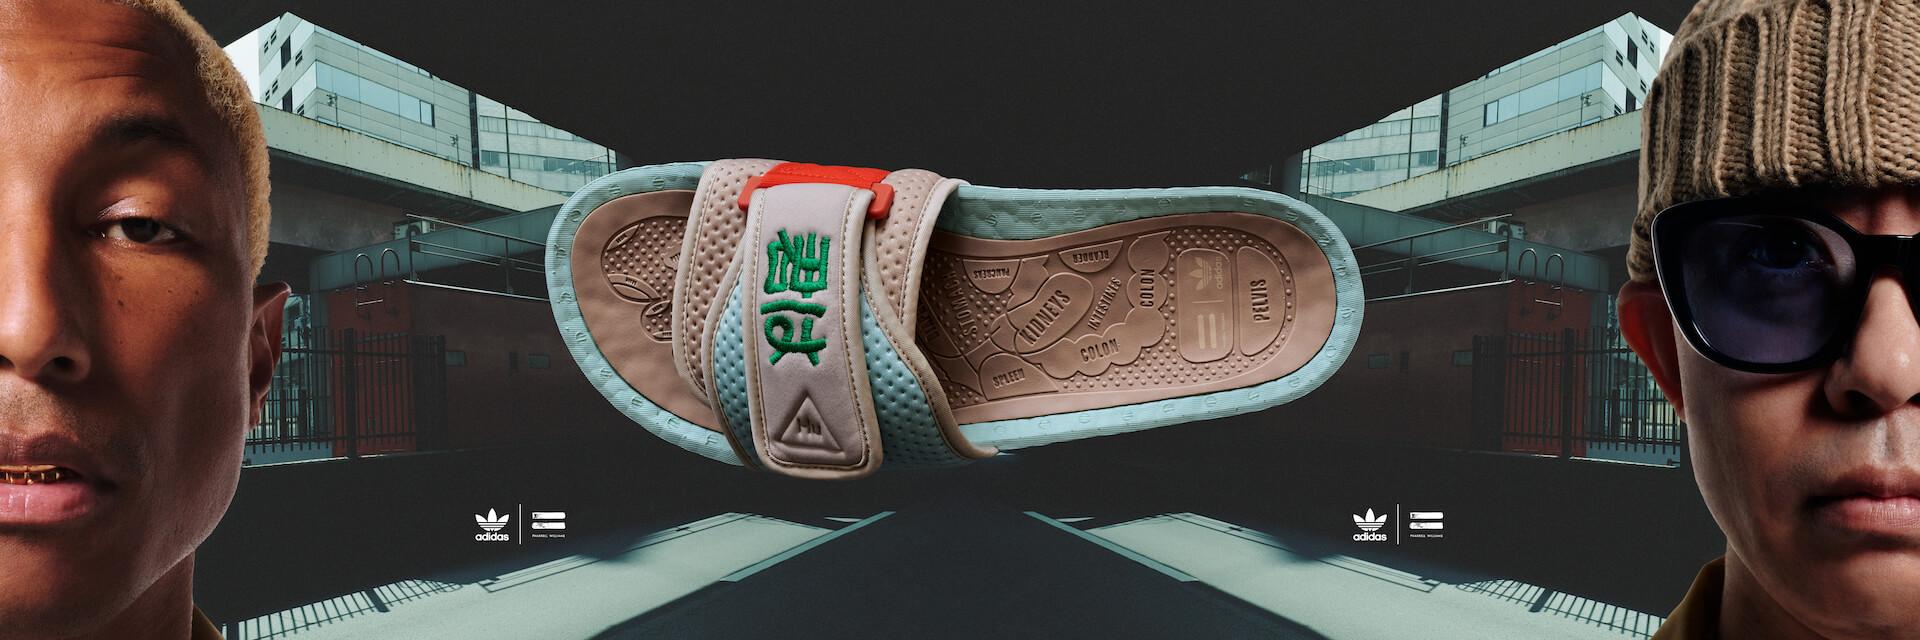 adidas Originalsから『Pharrell Williams x NIGO(R)FRIENDSHIP PACK』が発売!2種類のフットウェアが登場 fashion201217_adidas_pharrell_nigo_2